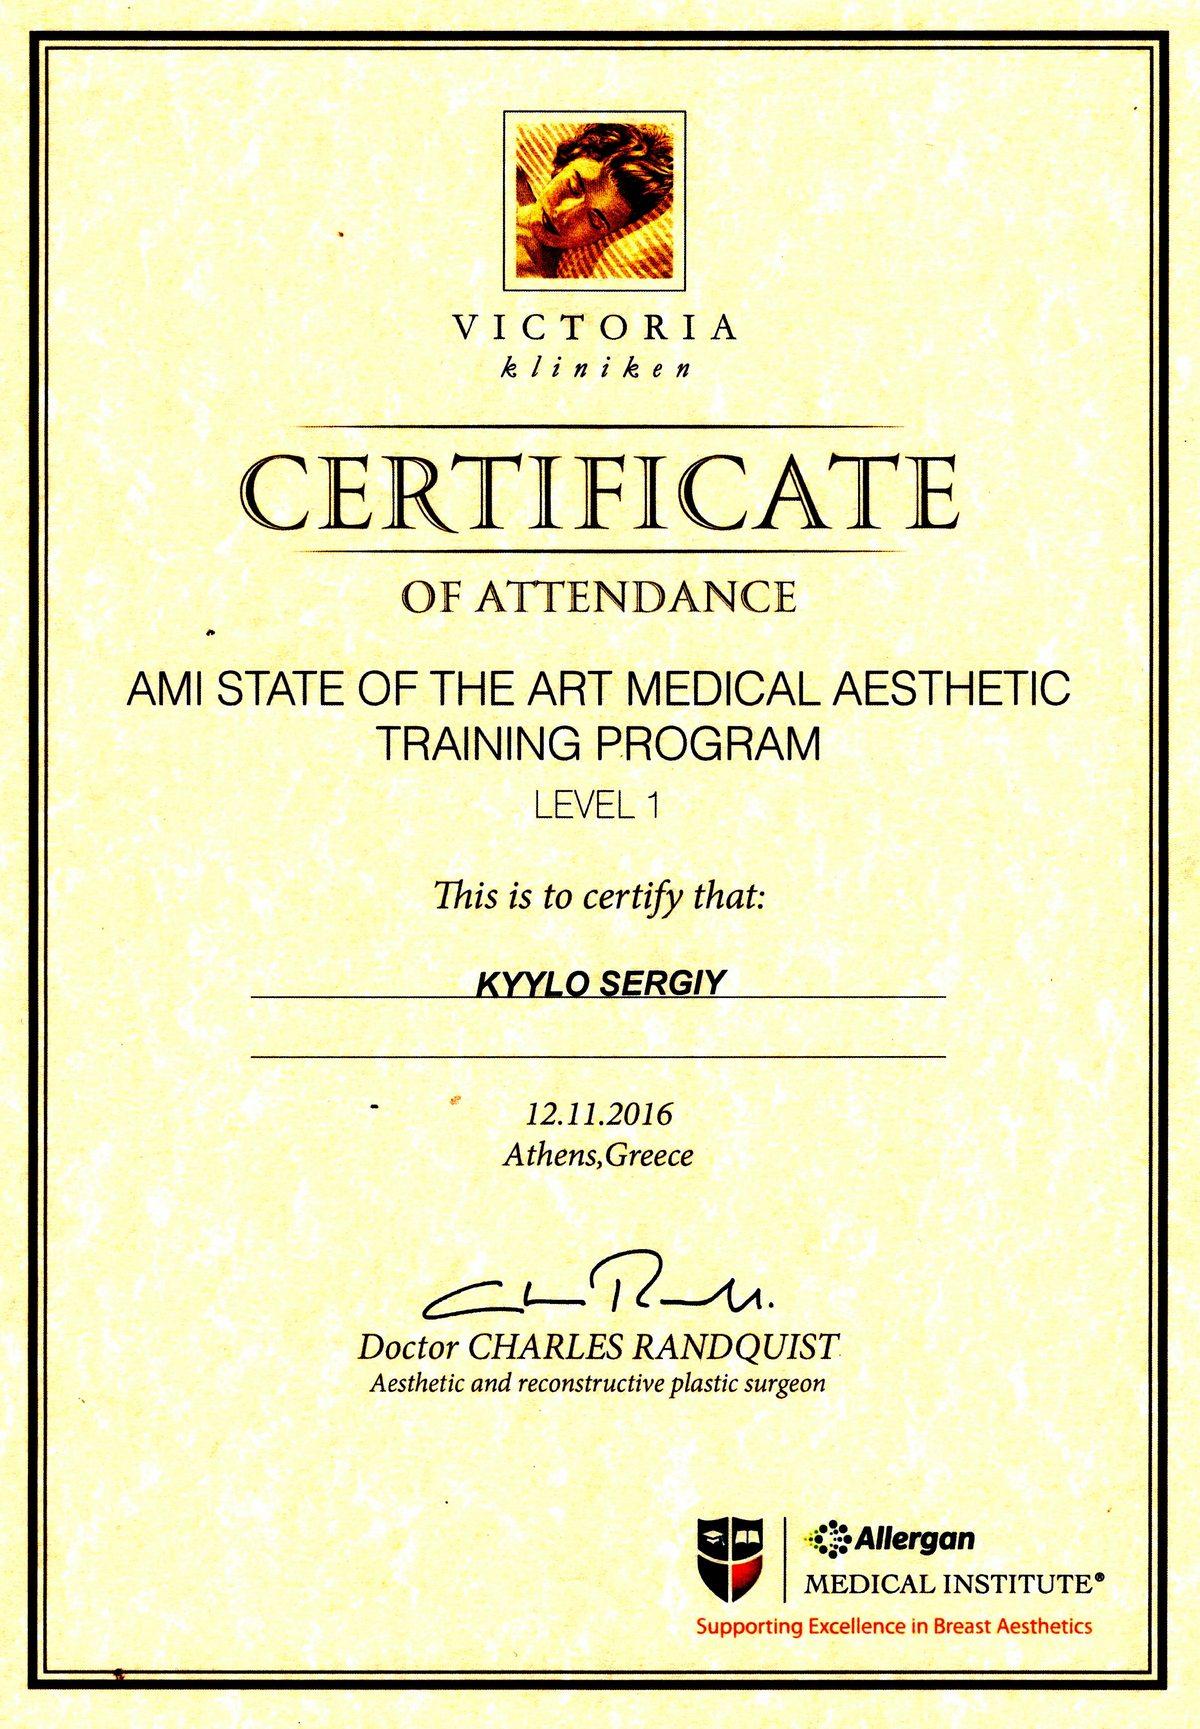 Документ №:4 Сертификат пластического хирурга Кийло Сергея Алексеевича